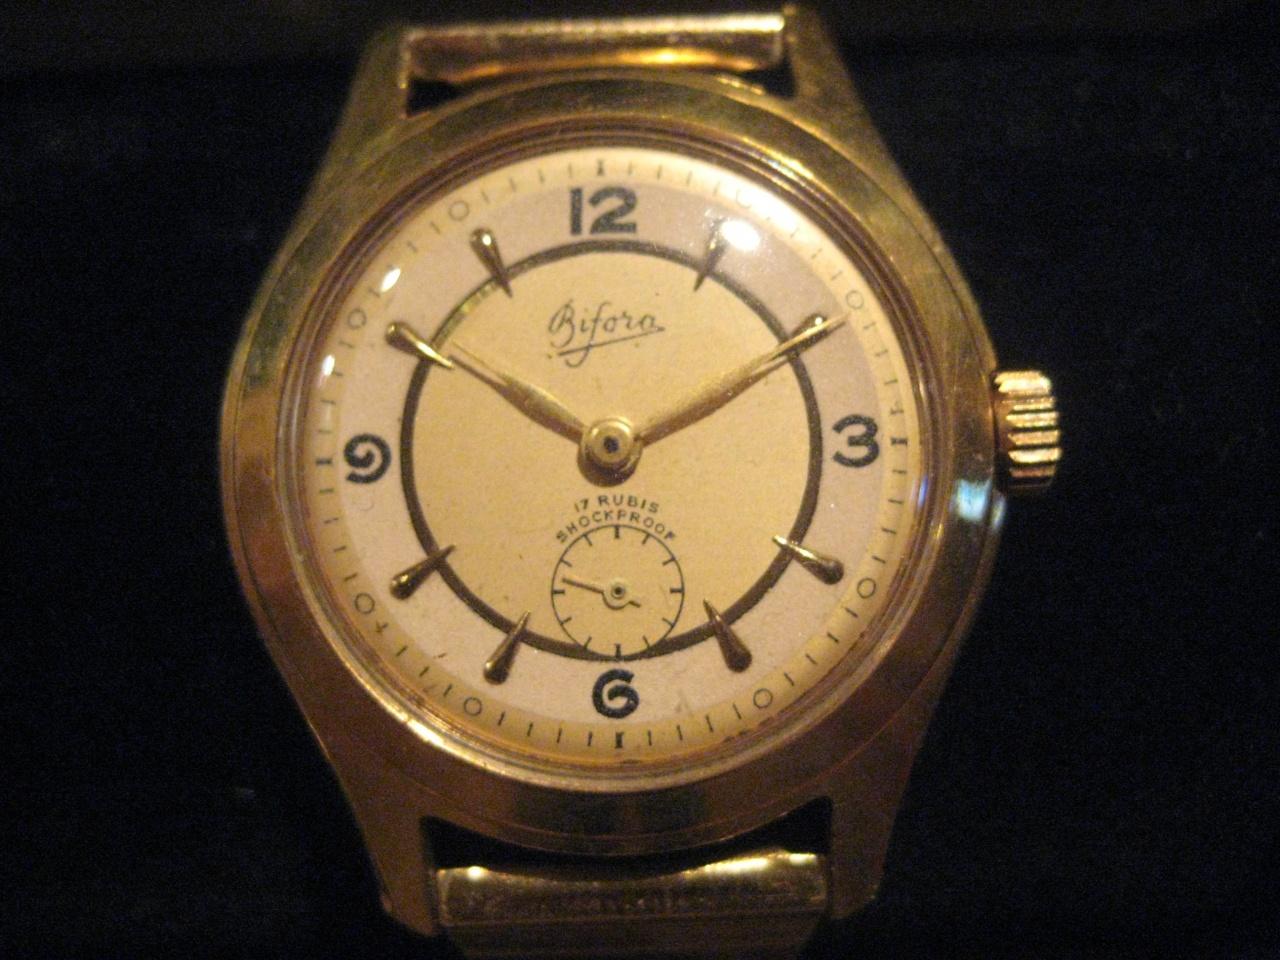 Bifora Mechanical Chronograph - Watches